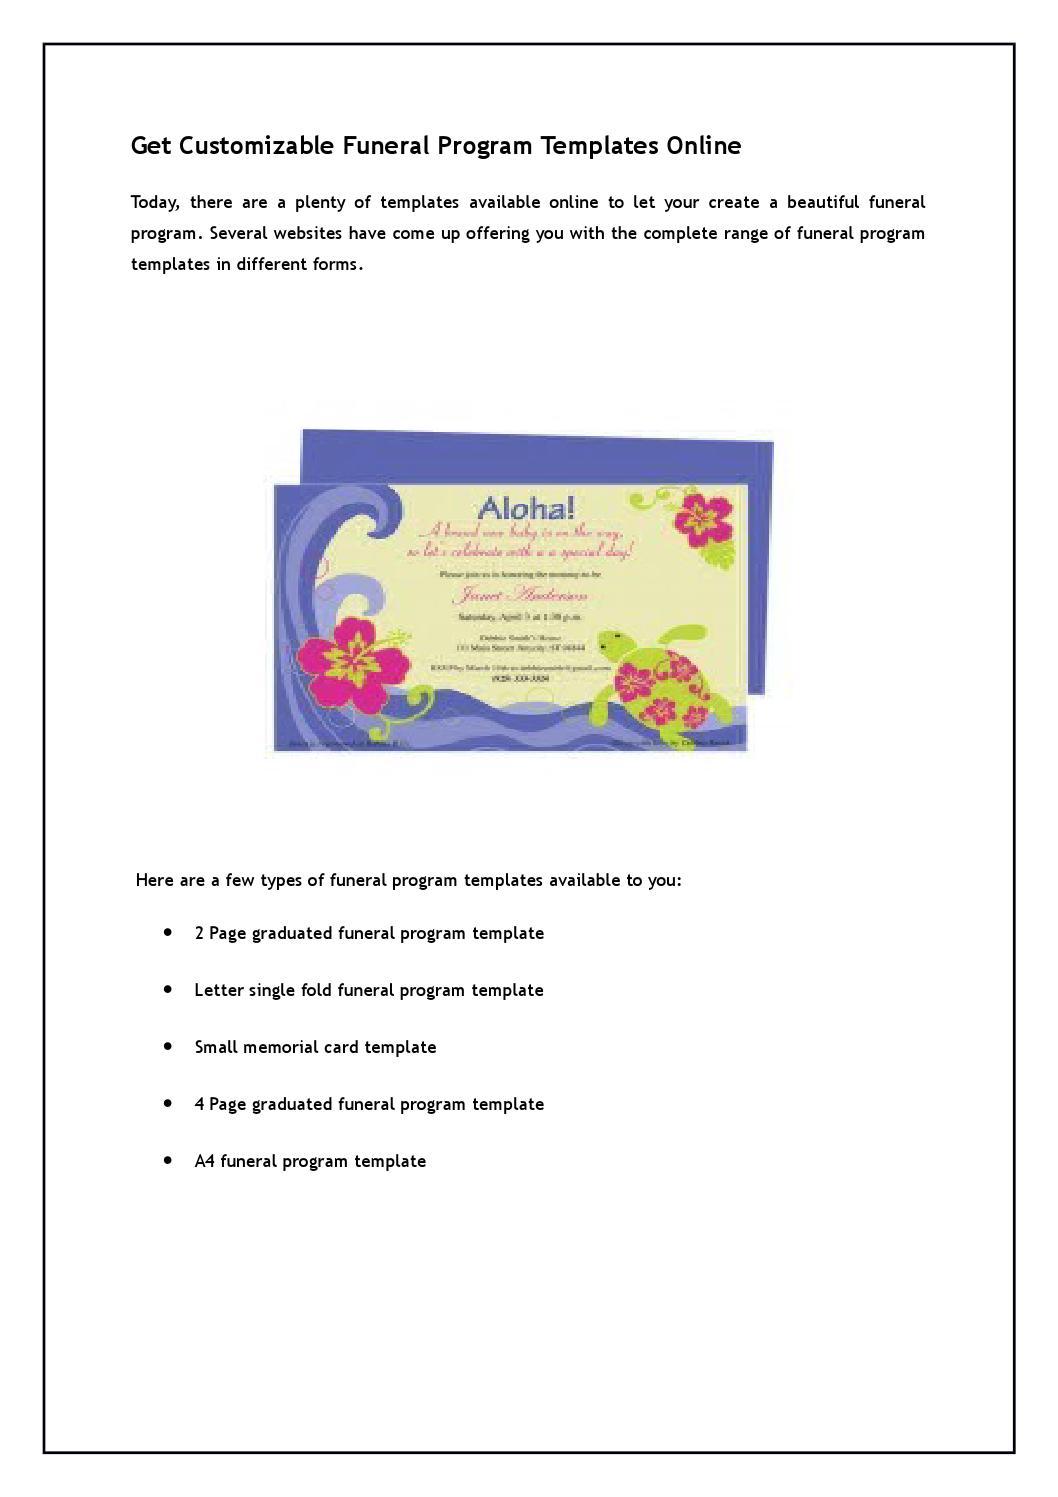 get customizable funeral program templates online by adamsmith121